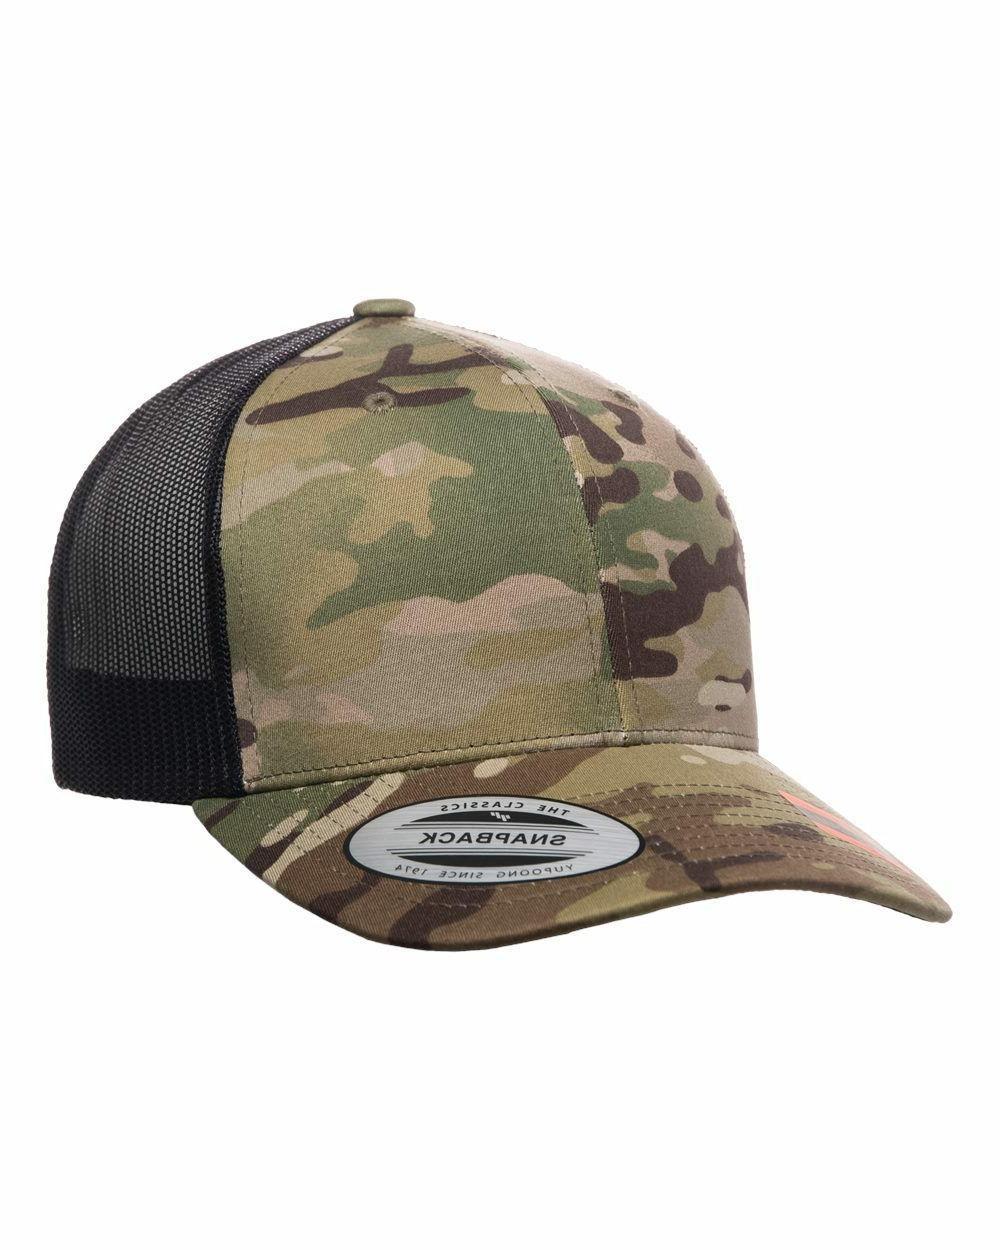 Cotton Trucker Snapback Hat 6606T